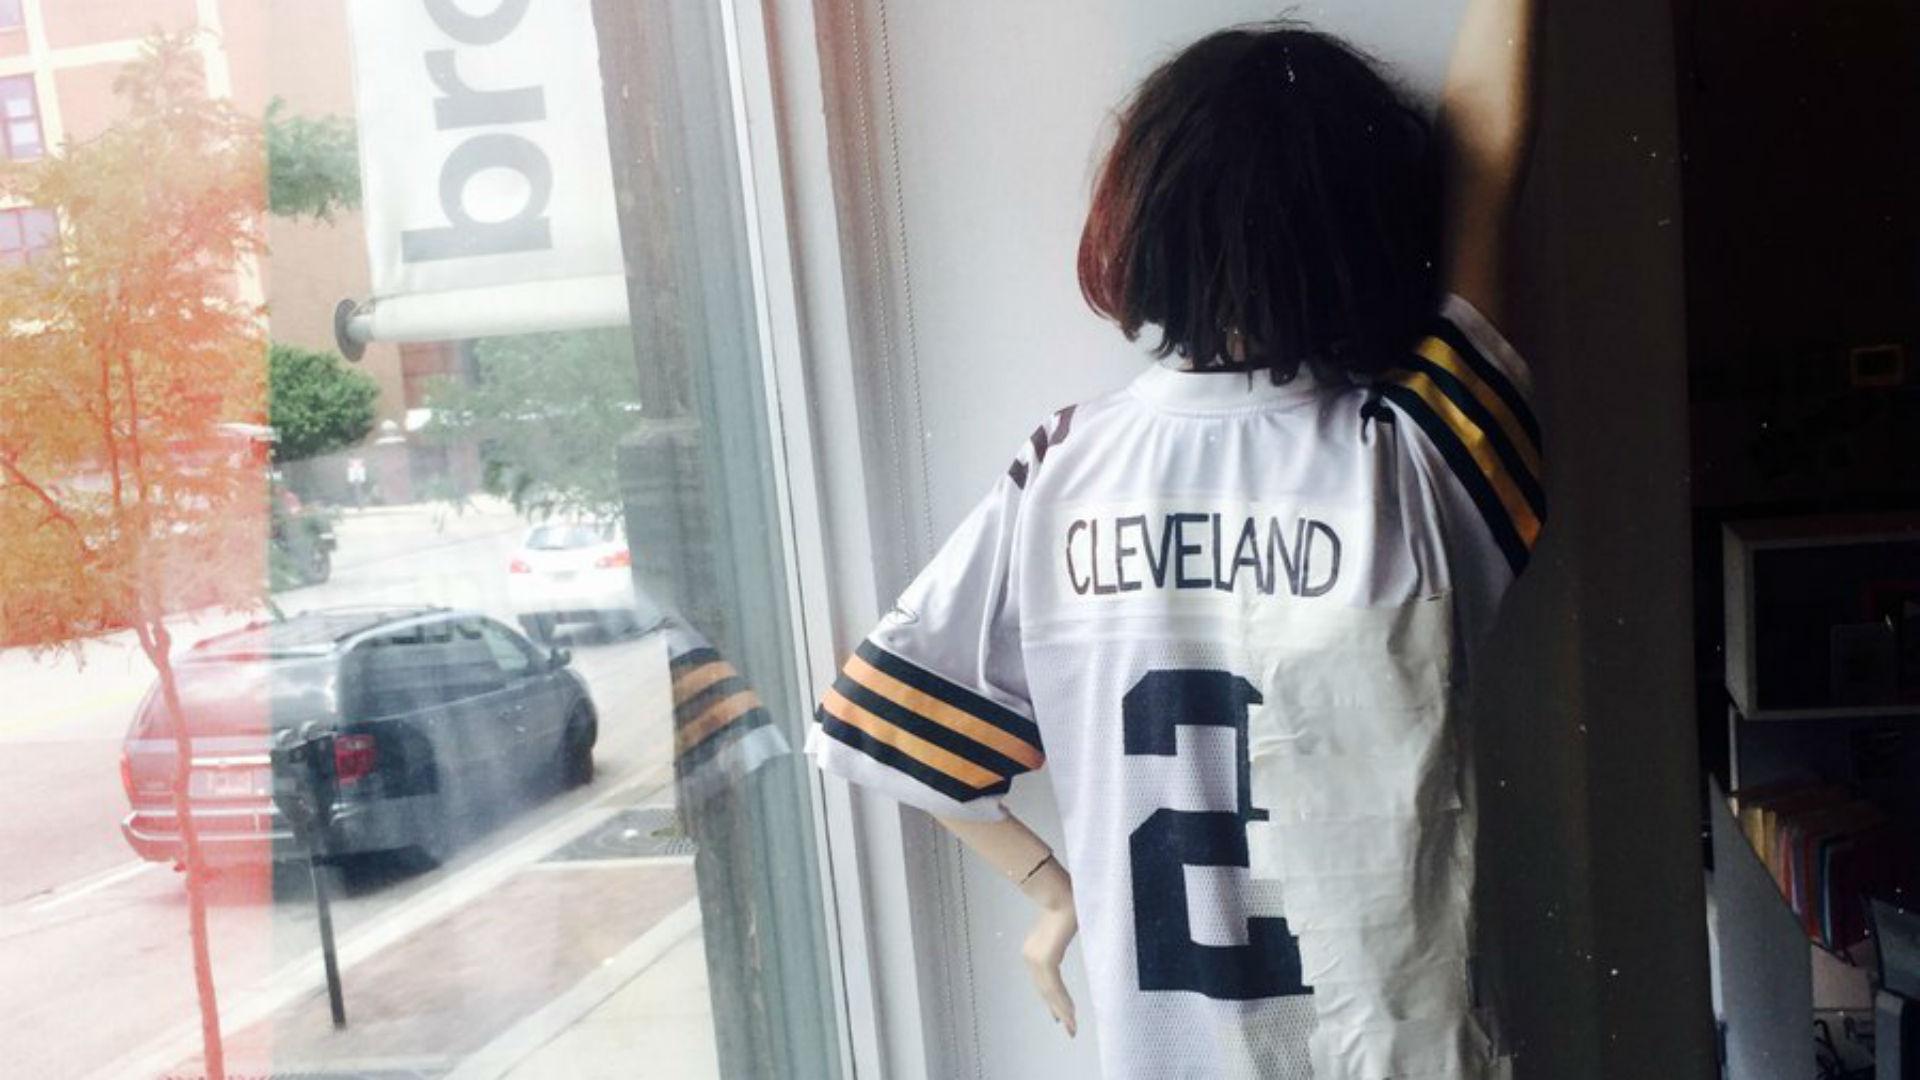 cleveland quarterback jersey